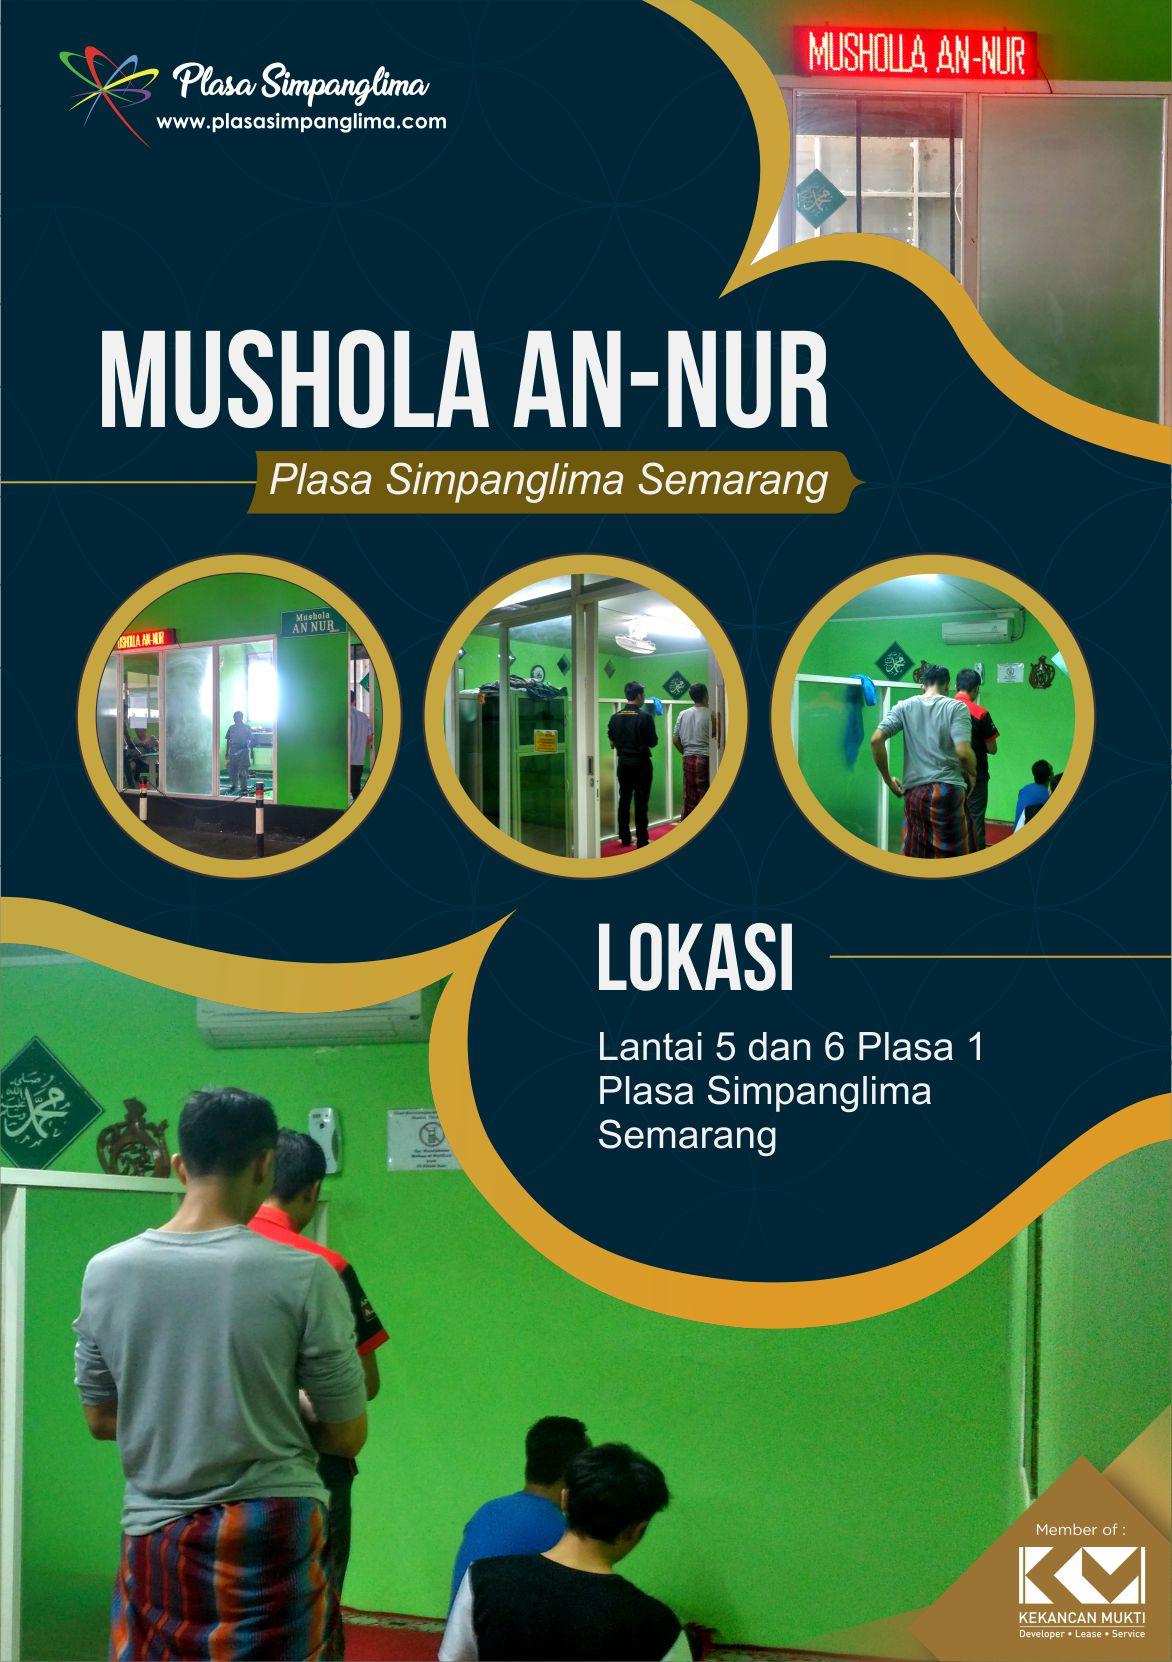 Mushola An Nur Plasa Simpanglima Semarang